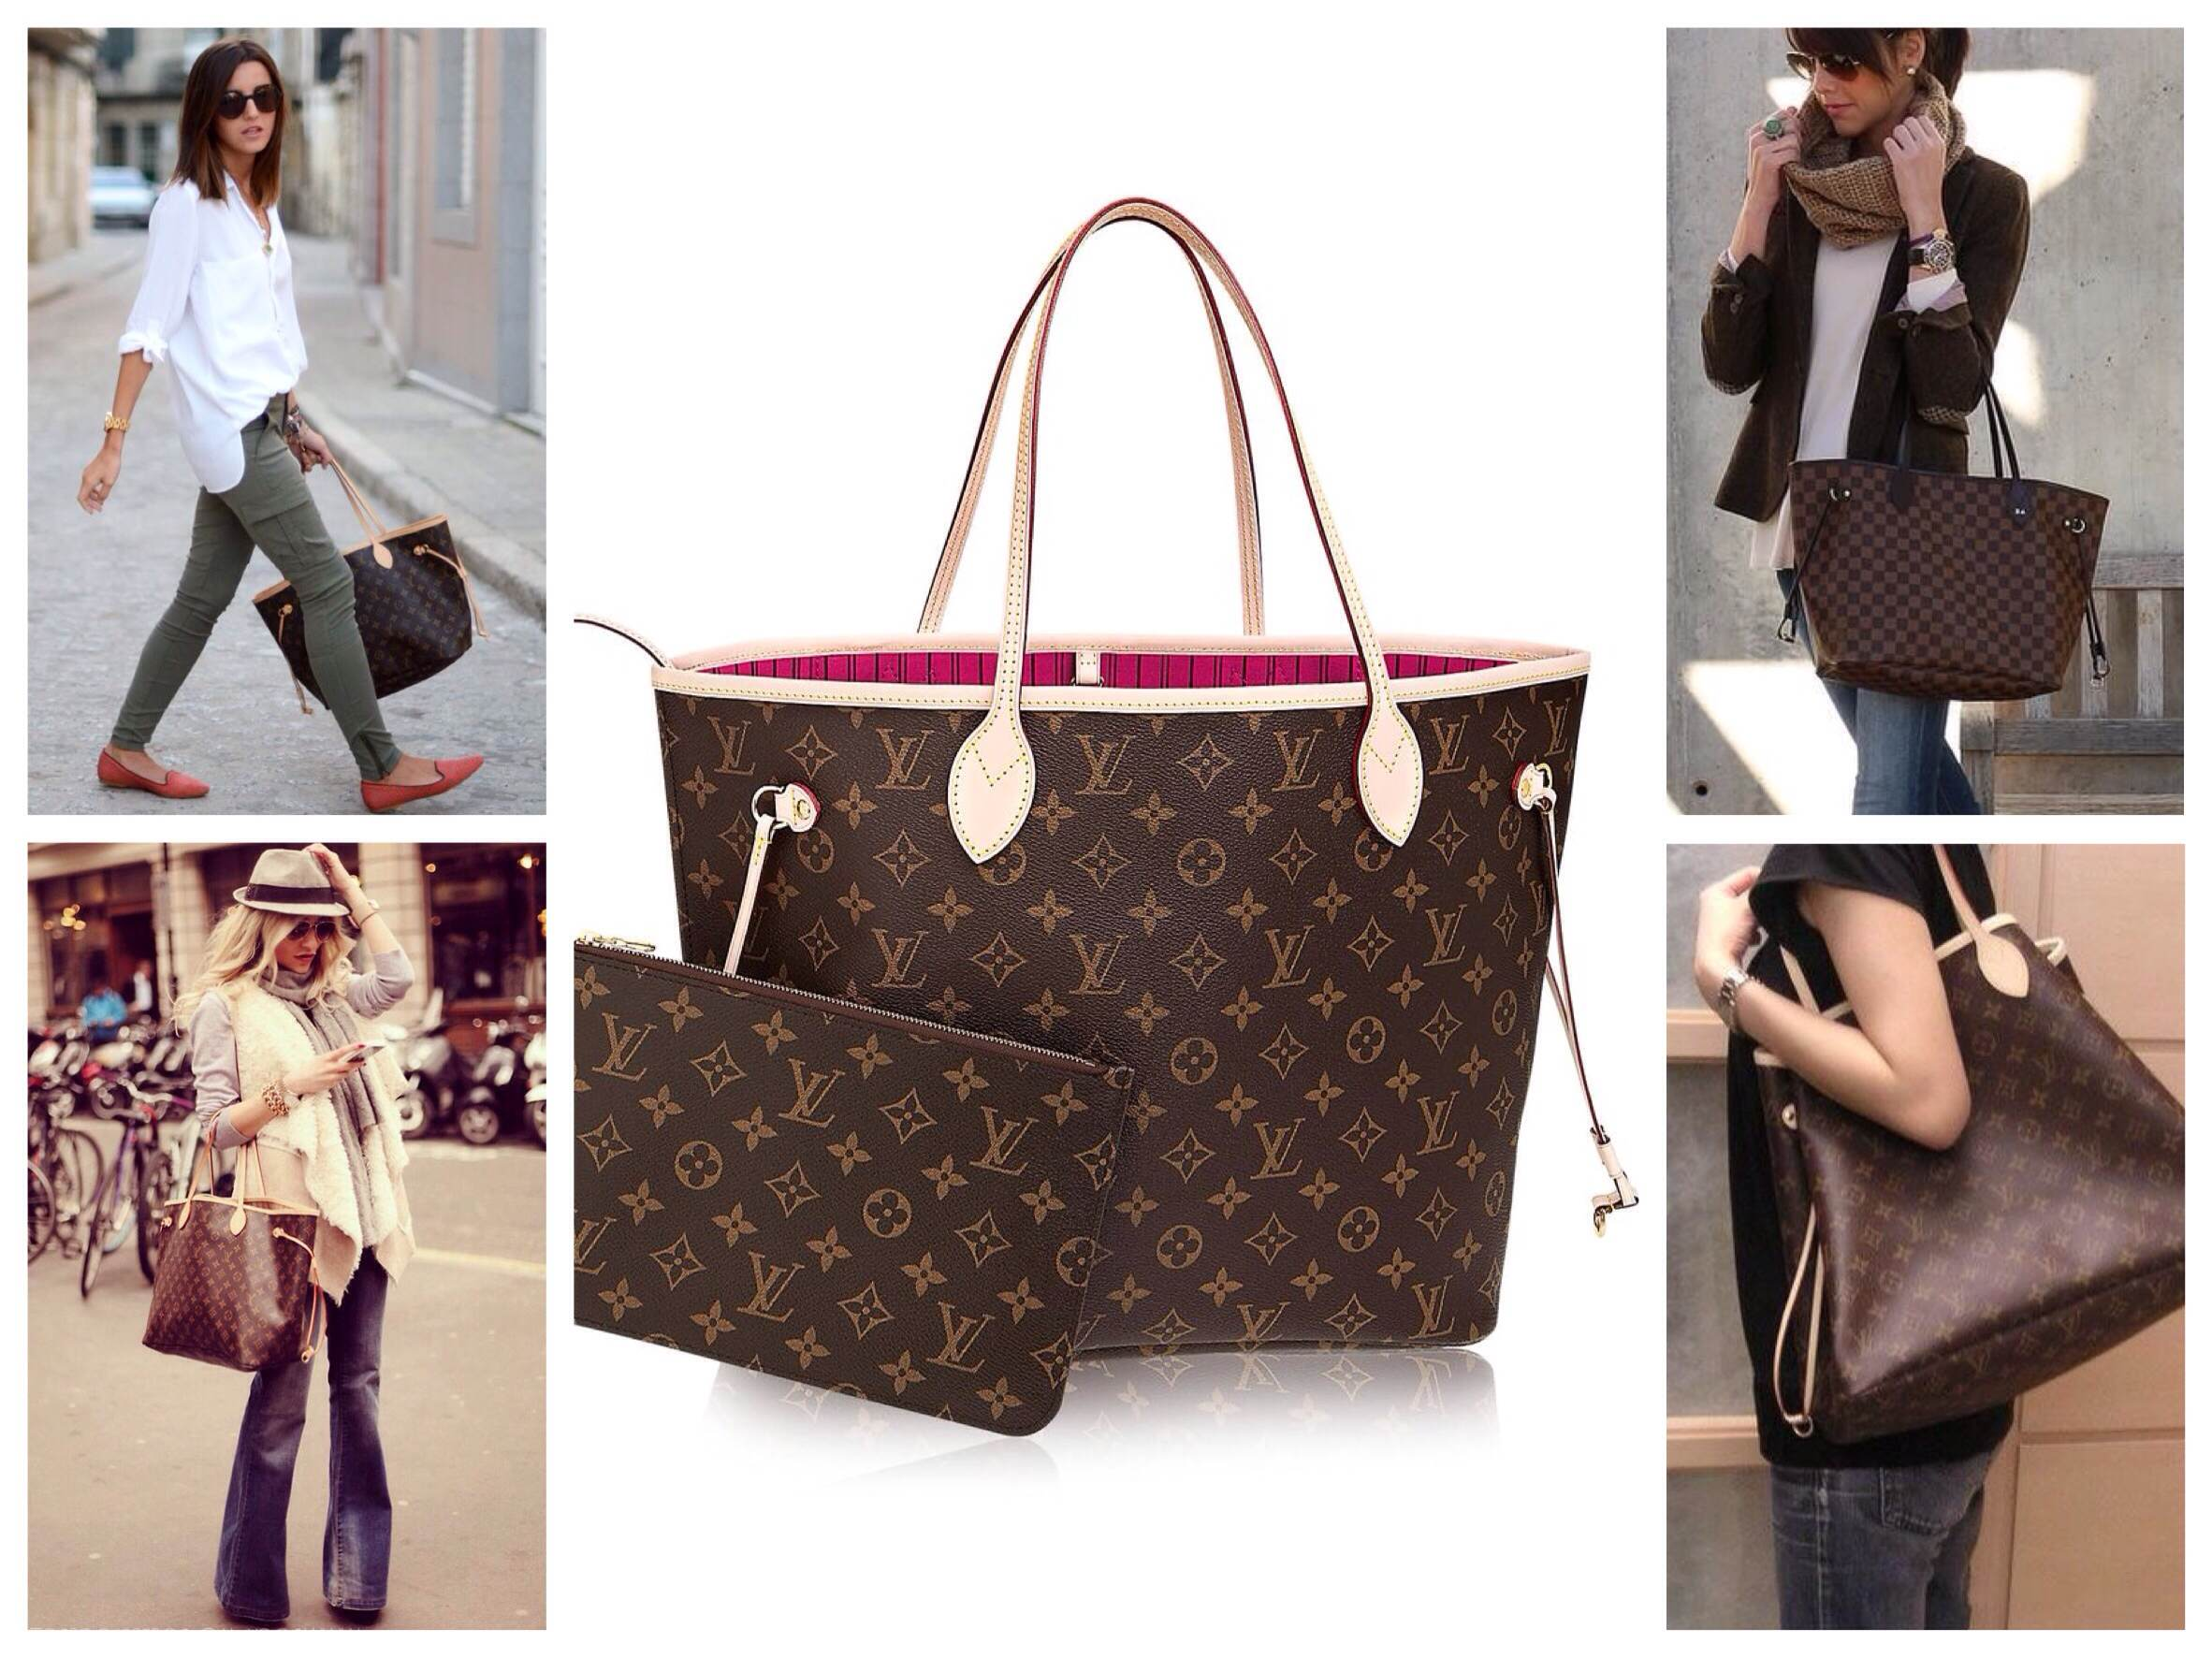 6a32d839b852 Известная форма сумки шоппер Neverfull от Louis Vuitton